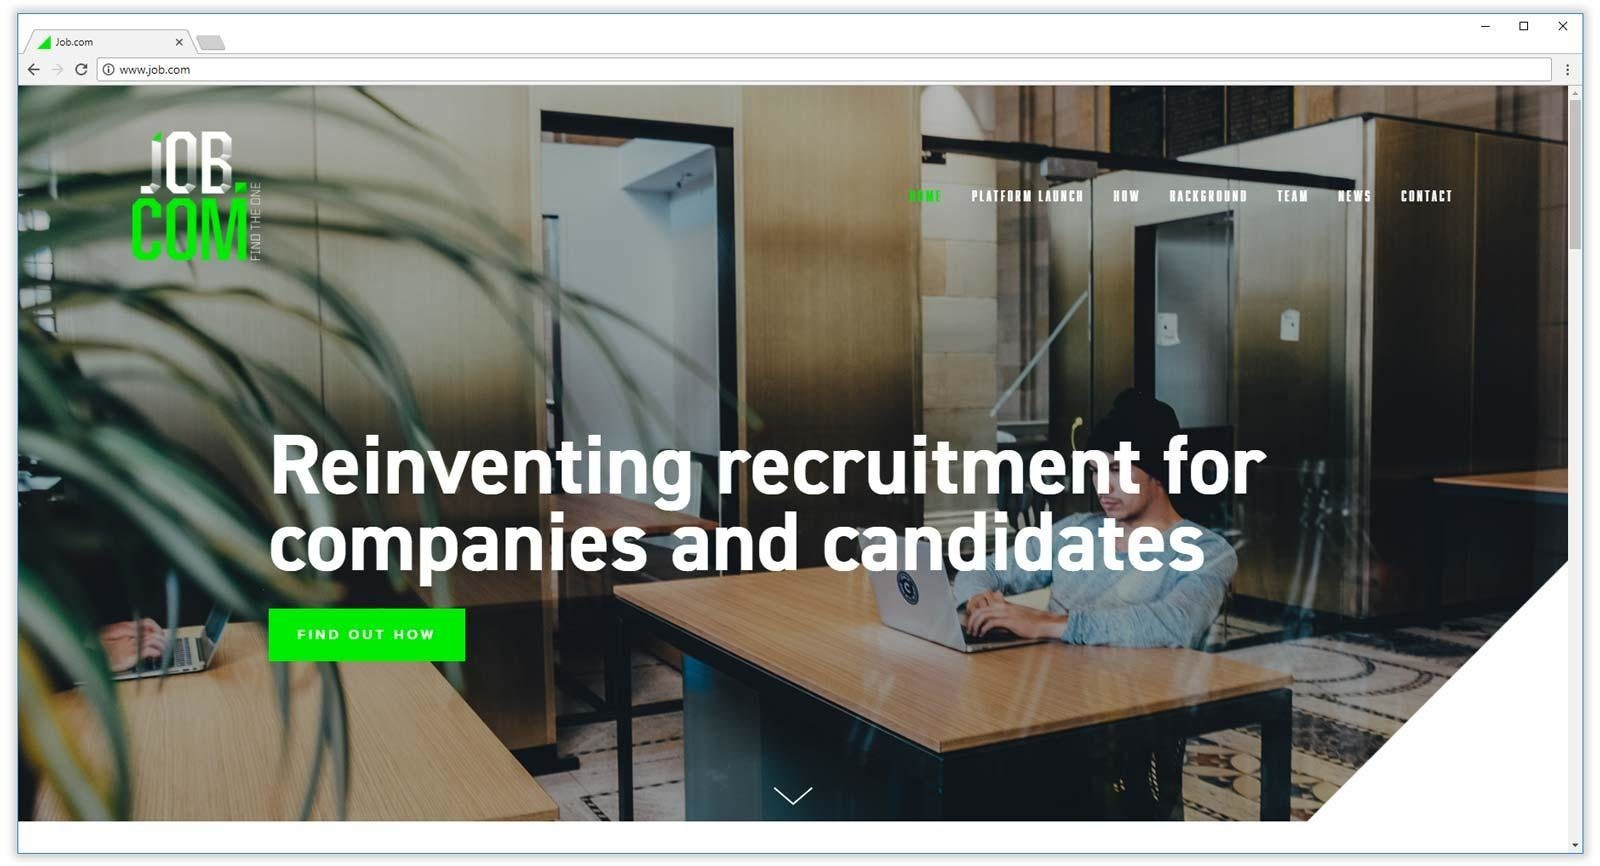 job_homepage-6099078